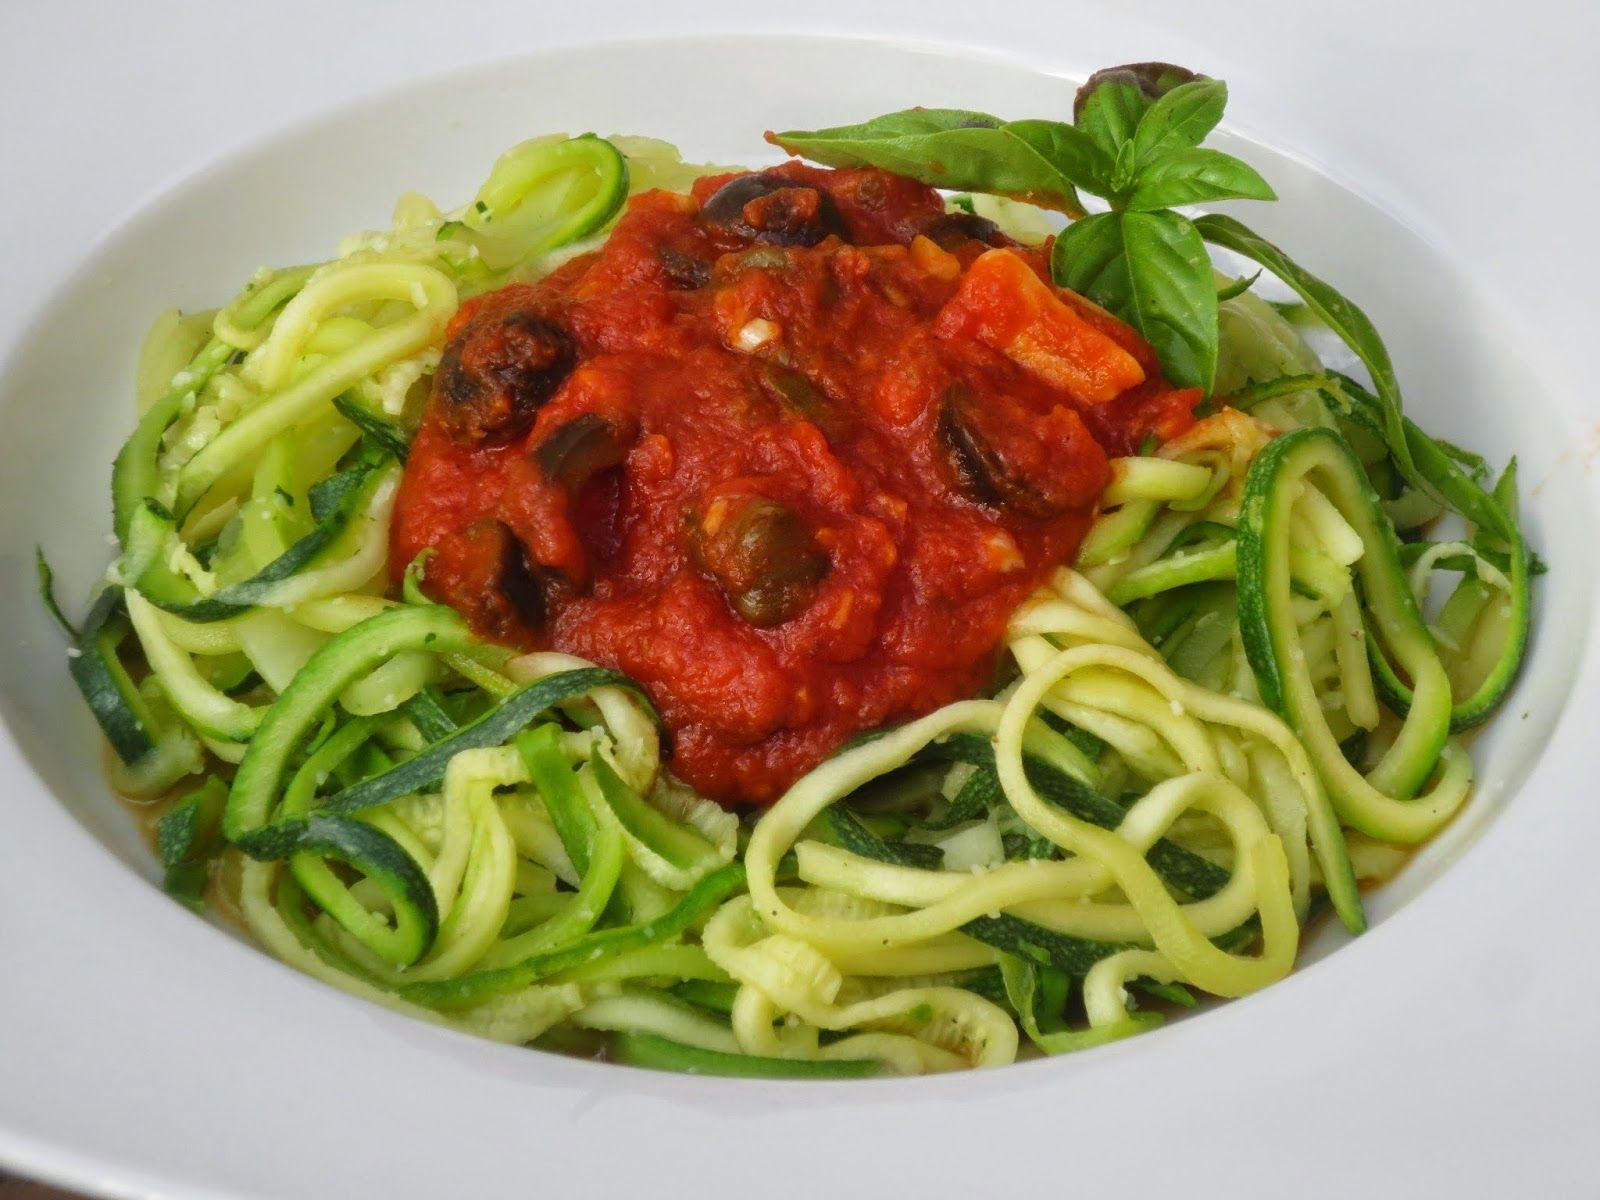 Espaguetis de calabac n a la putanesca ana sevilla con for Cocina saludable en 30 minutos thermomix